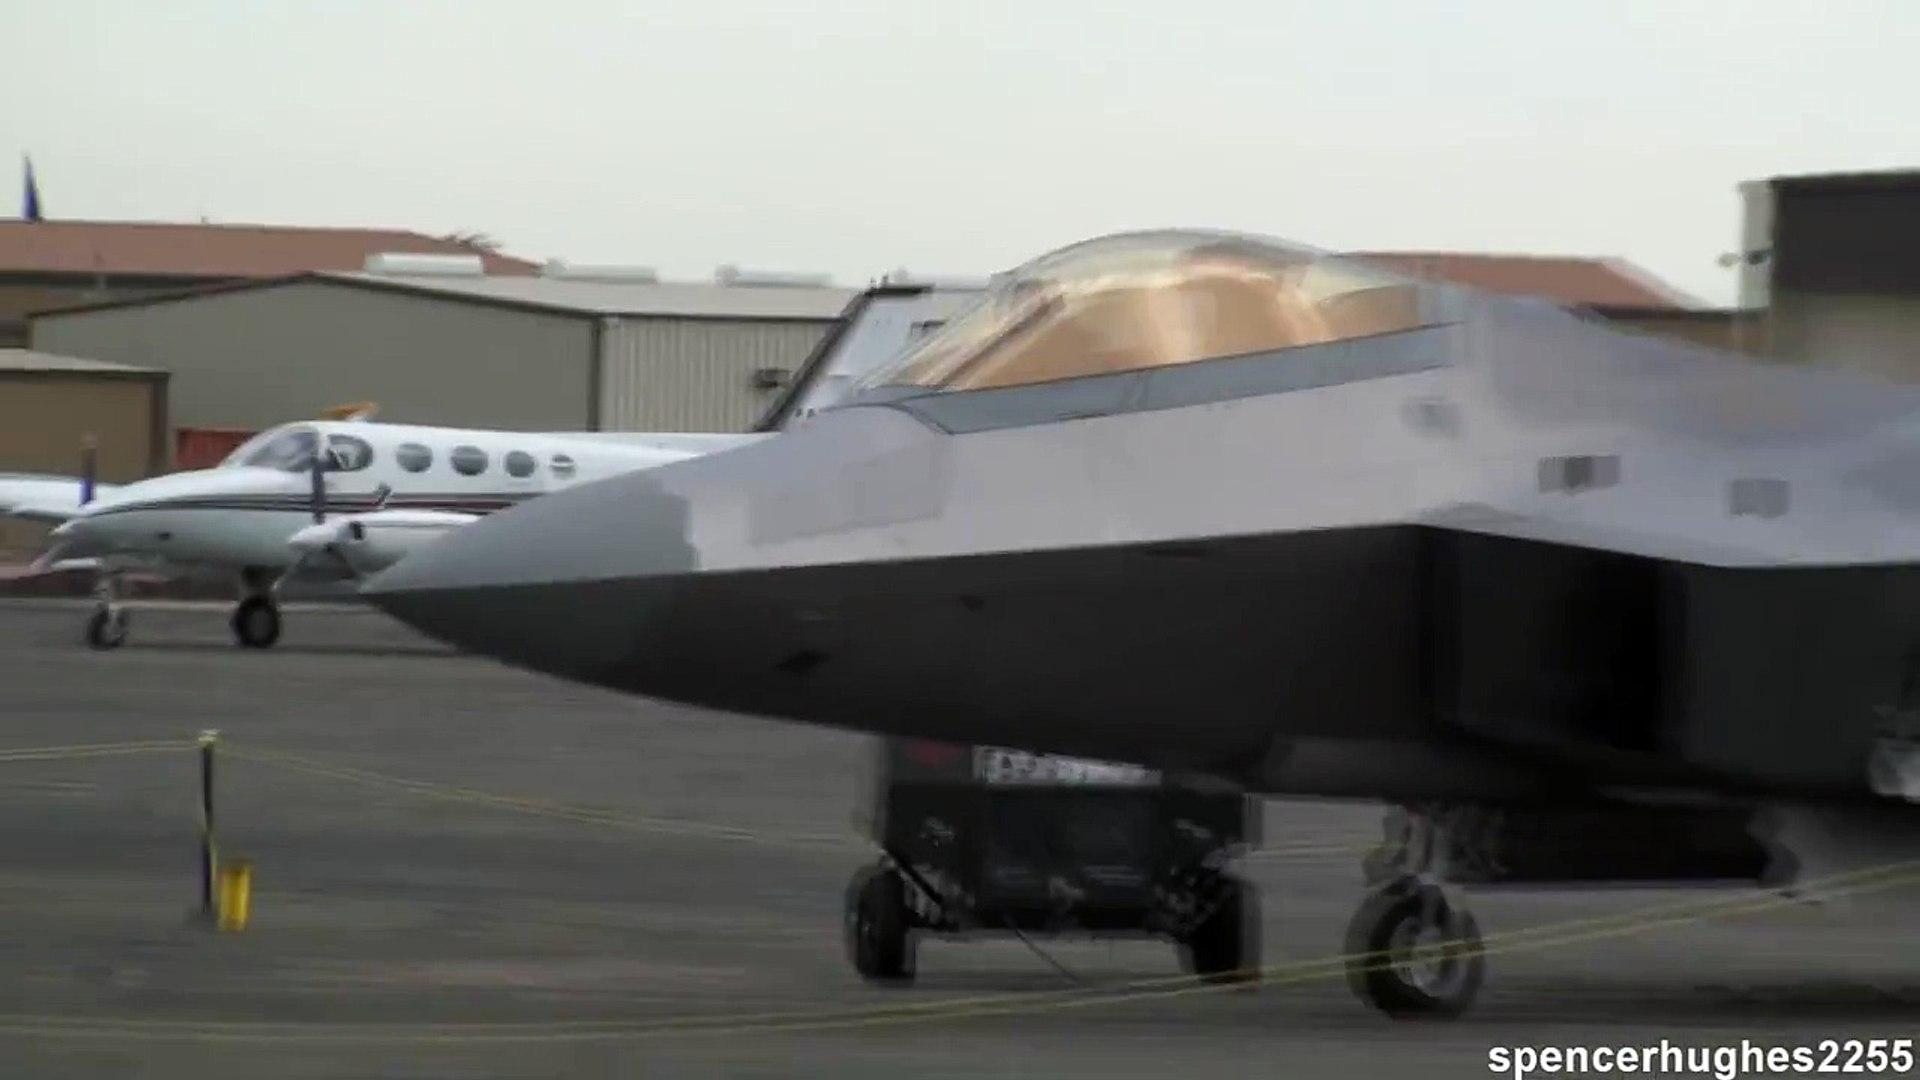 2009 California Capital air show - F-22 Raptors: FF 066 04 & FF 068 04